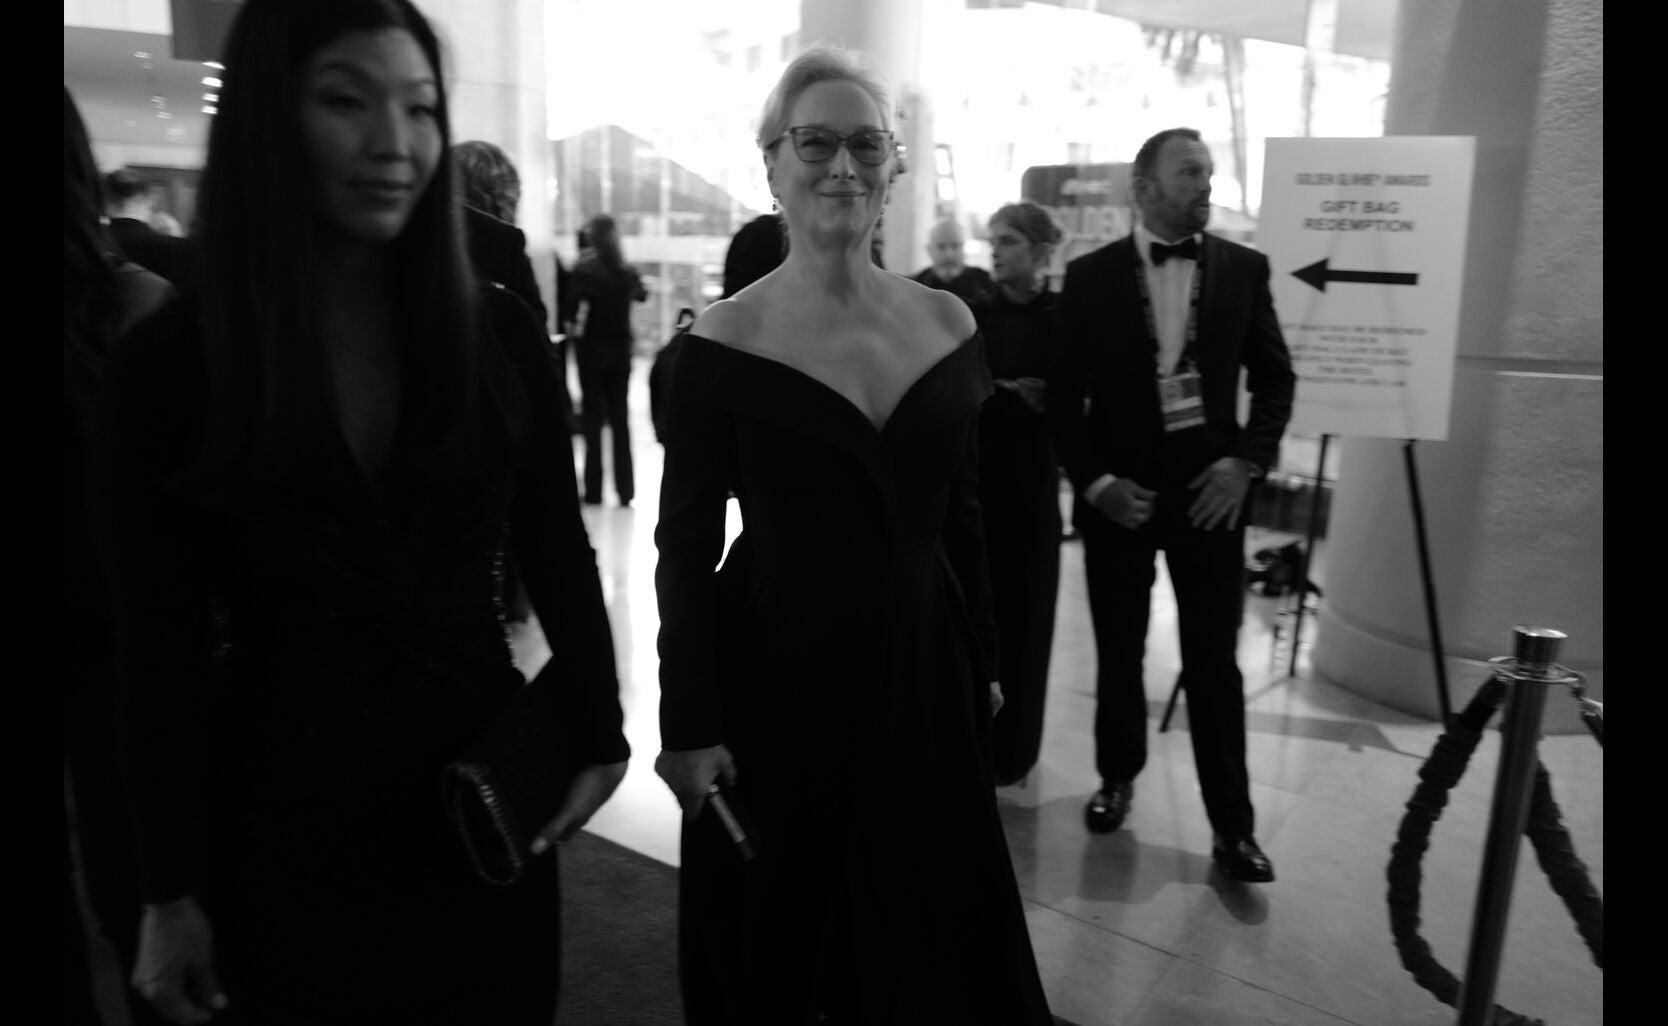 Actress Meryl Streep, Golden Globe winner and nominee